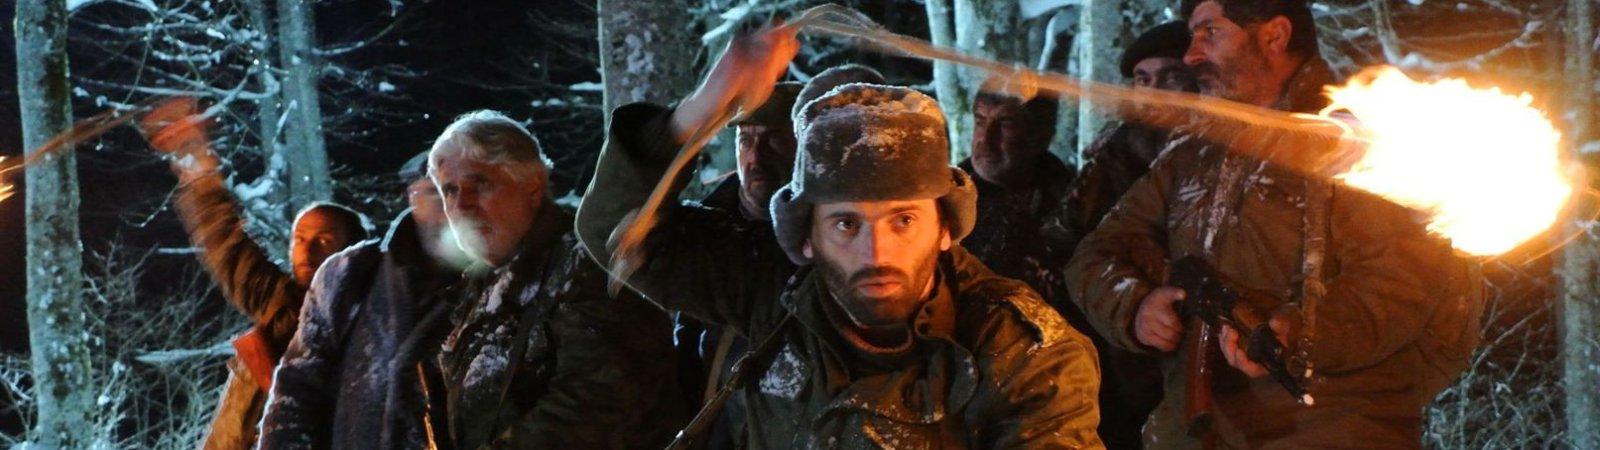 Photo dernier film George Ovashvili